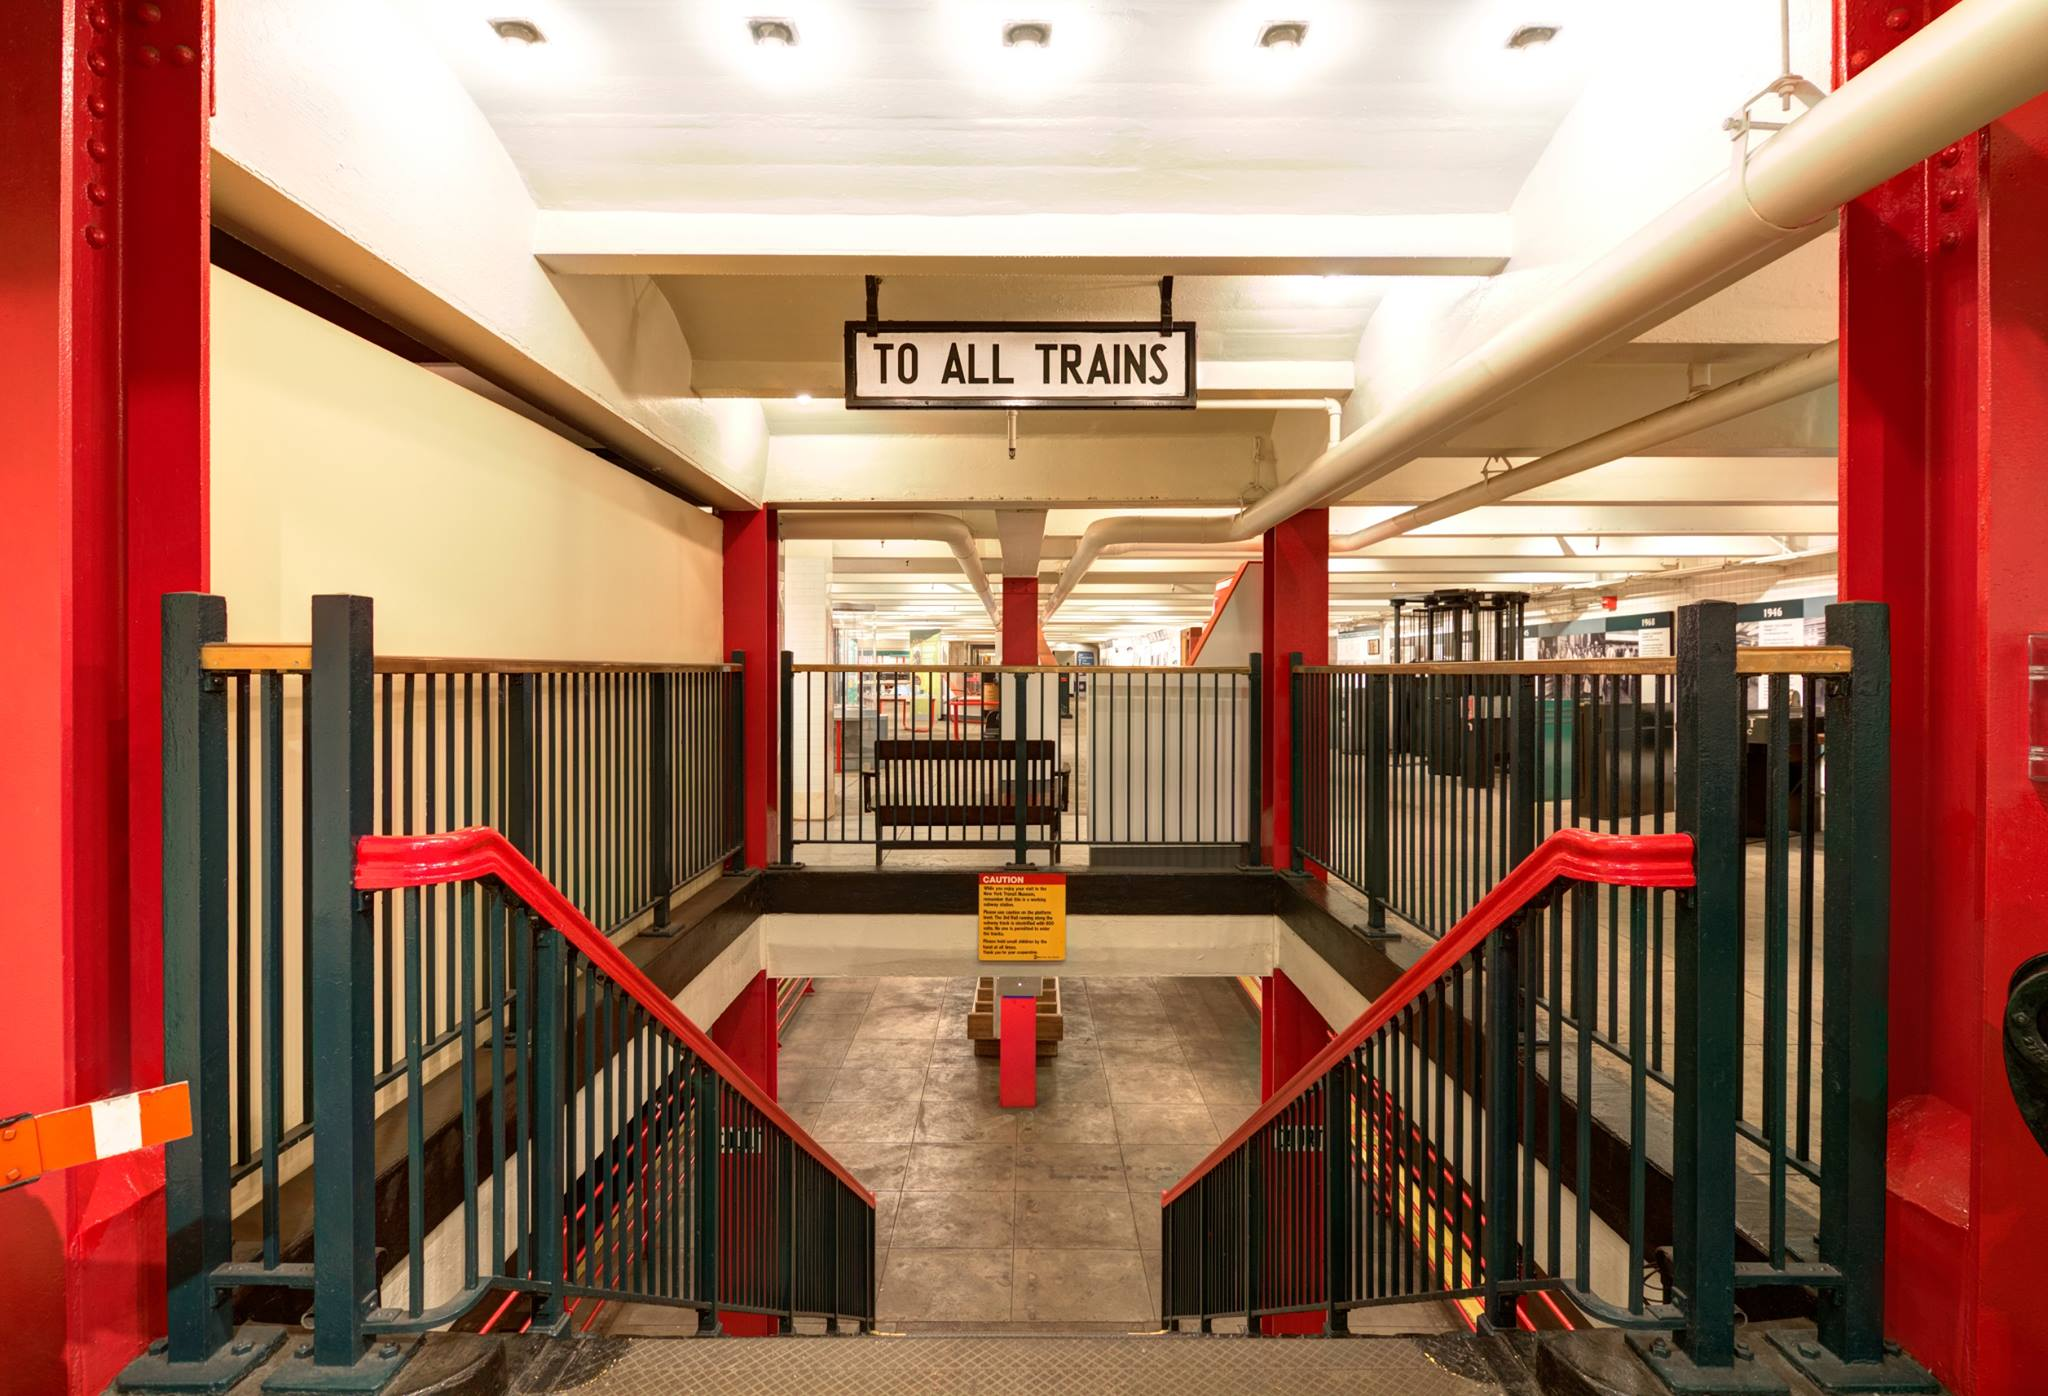 photo via  Facebook/New York Transit Museum